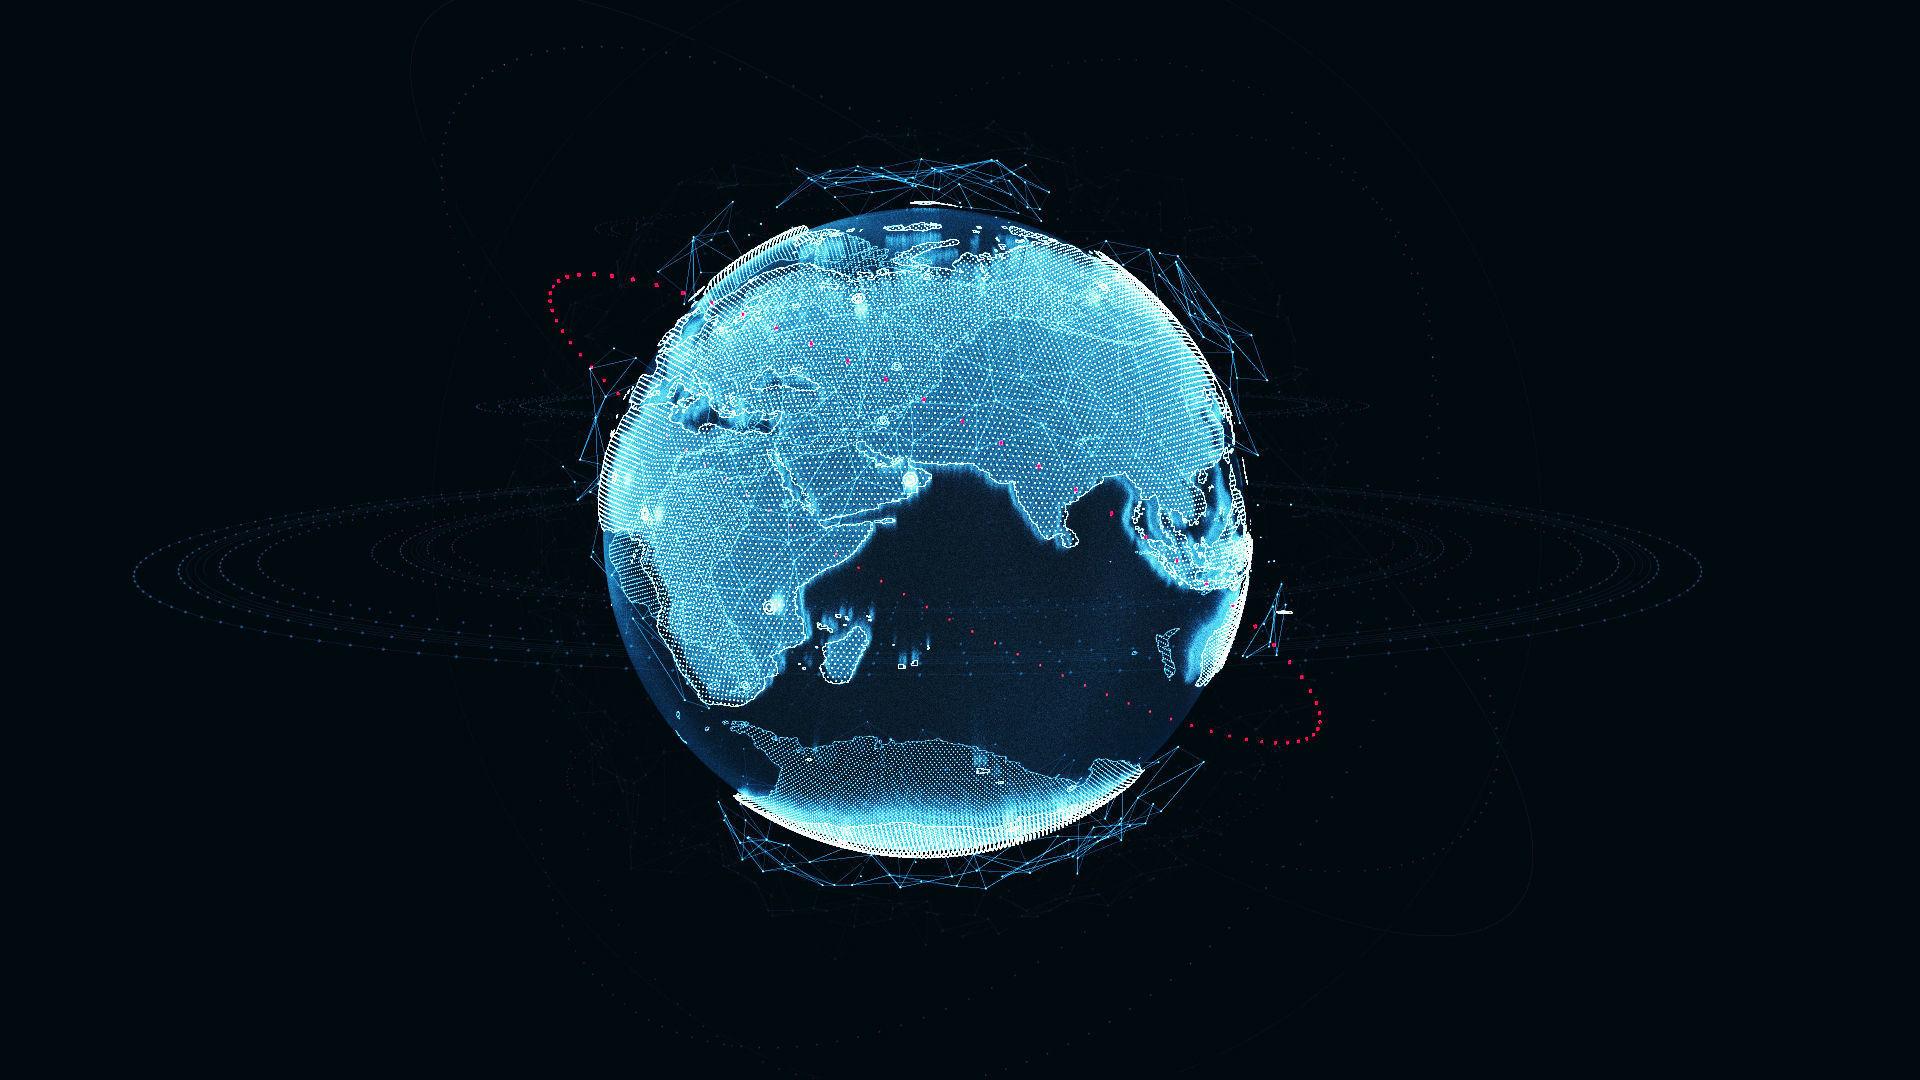 Animated Hologram Planet Earth v1